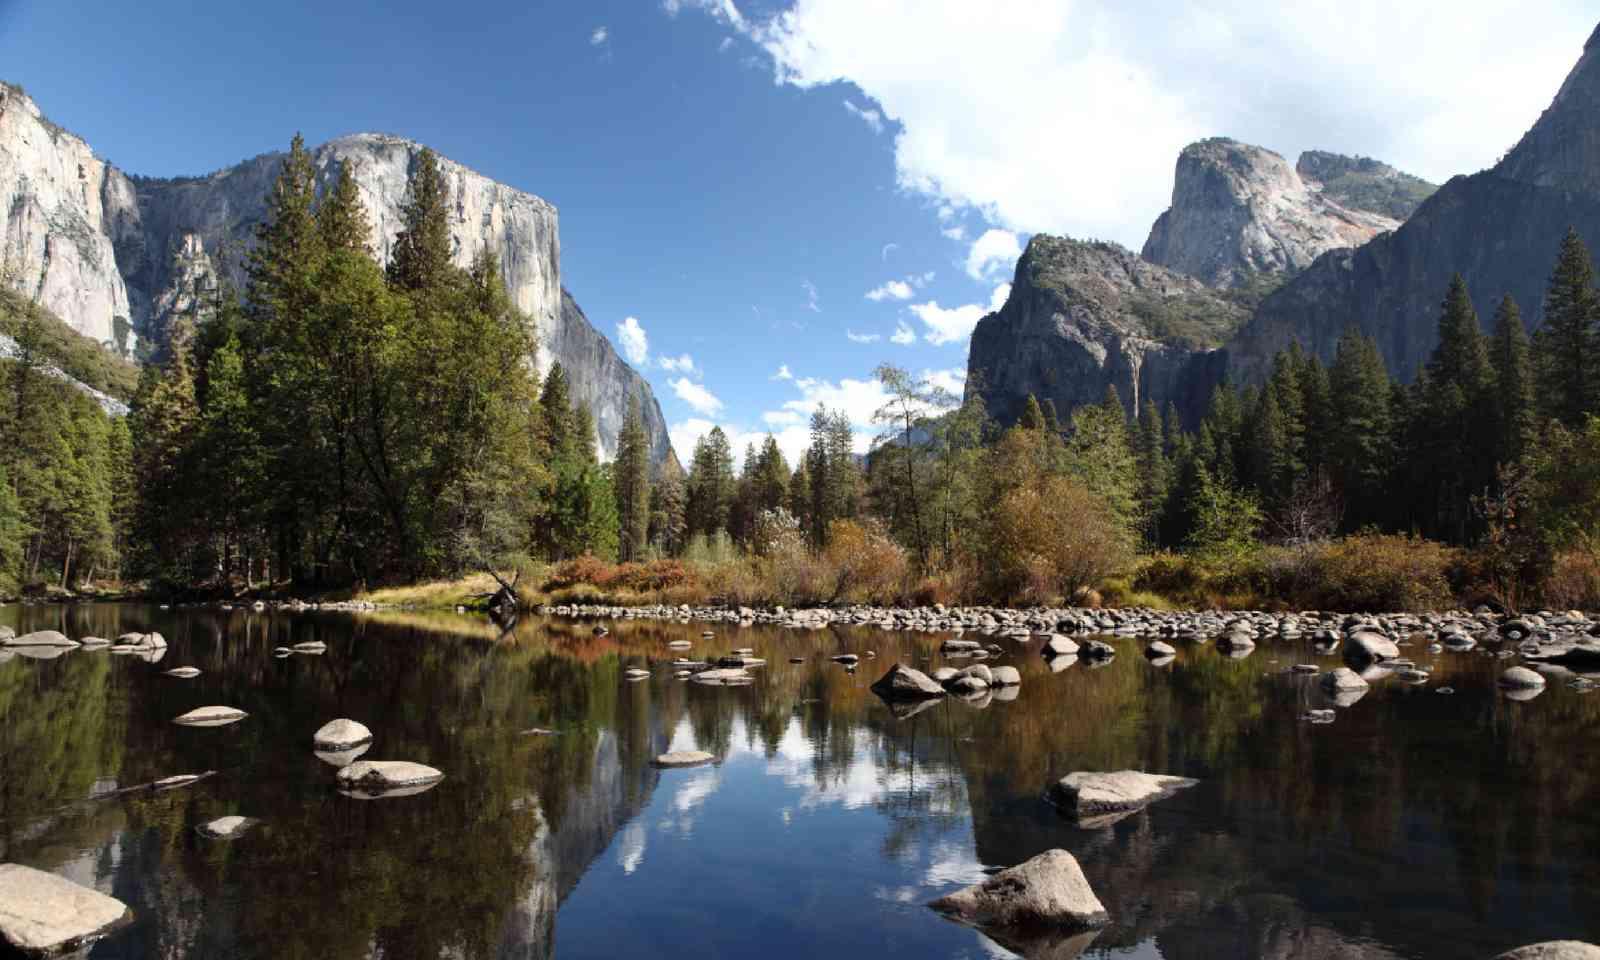 Merced River reflection (Shutterstock)